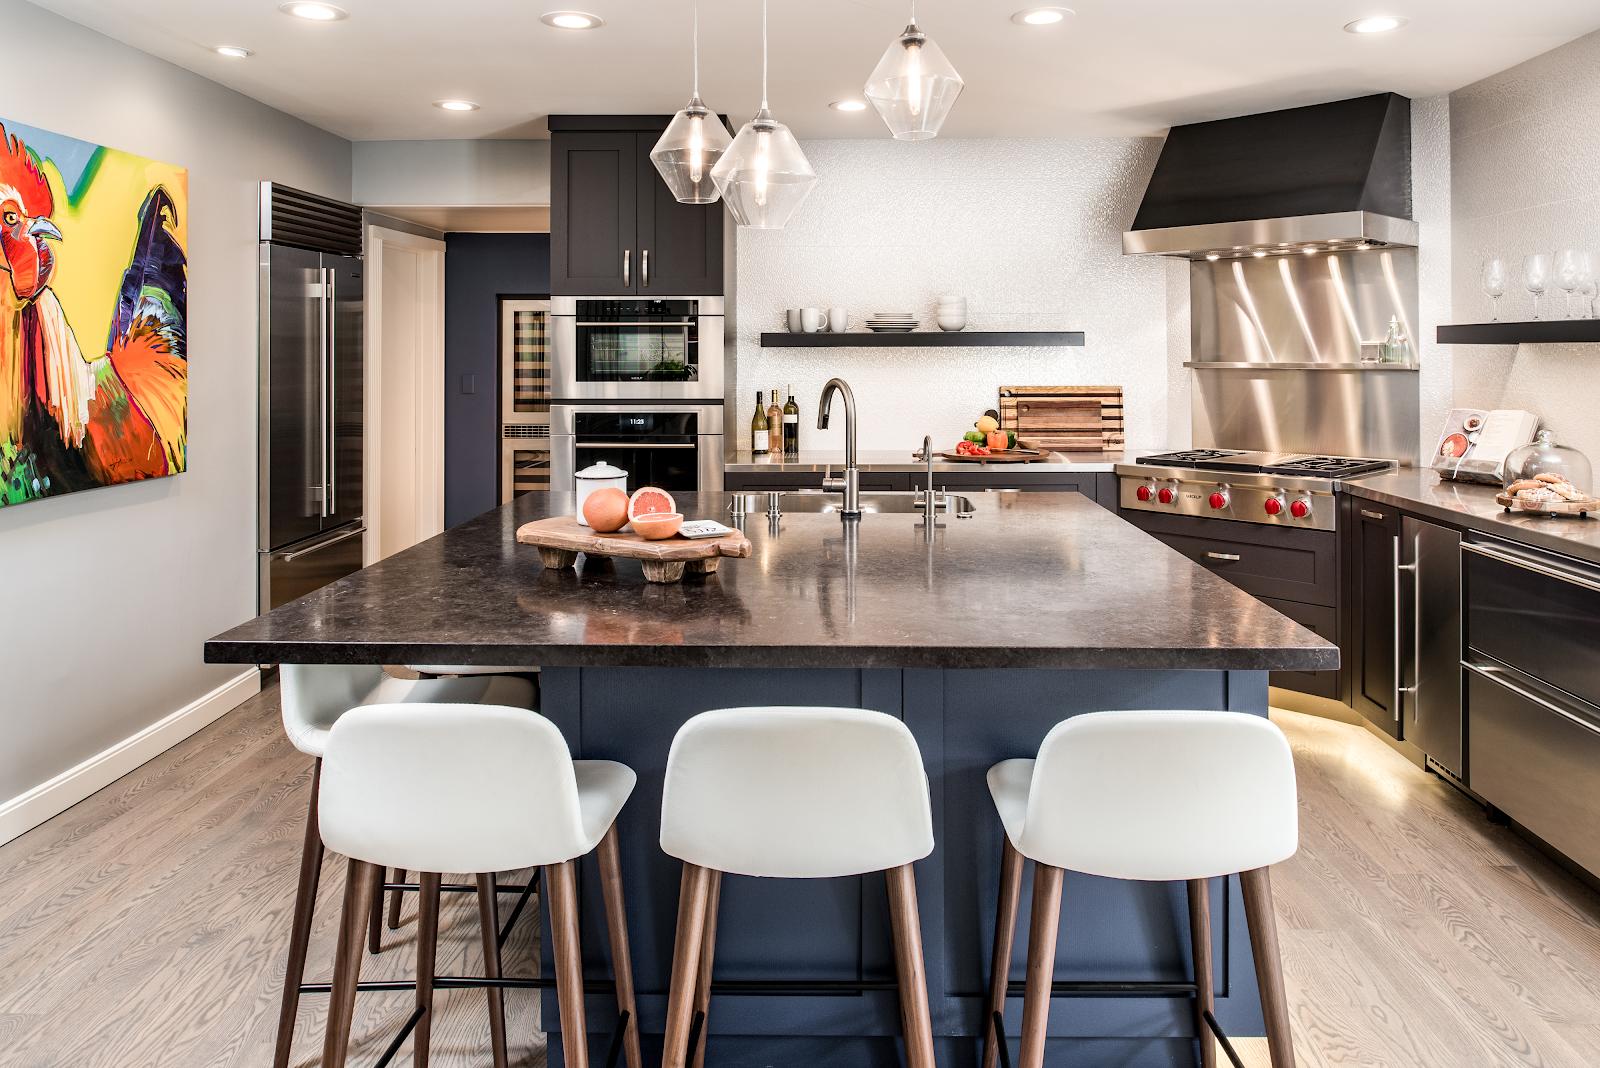 4 examples to create good modular kitchen designs?